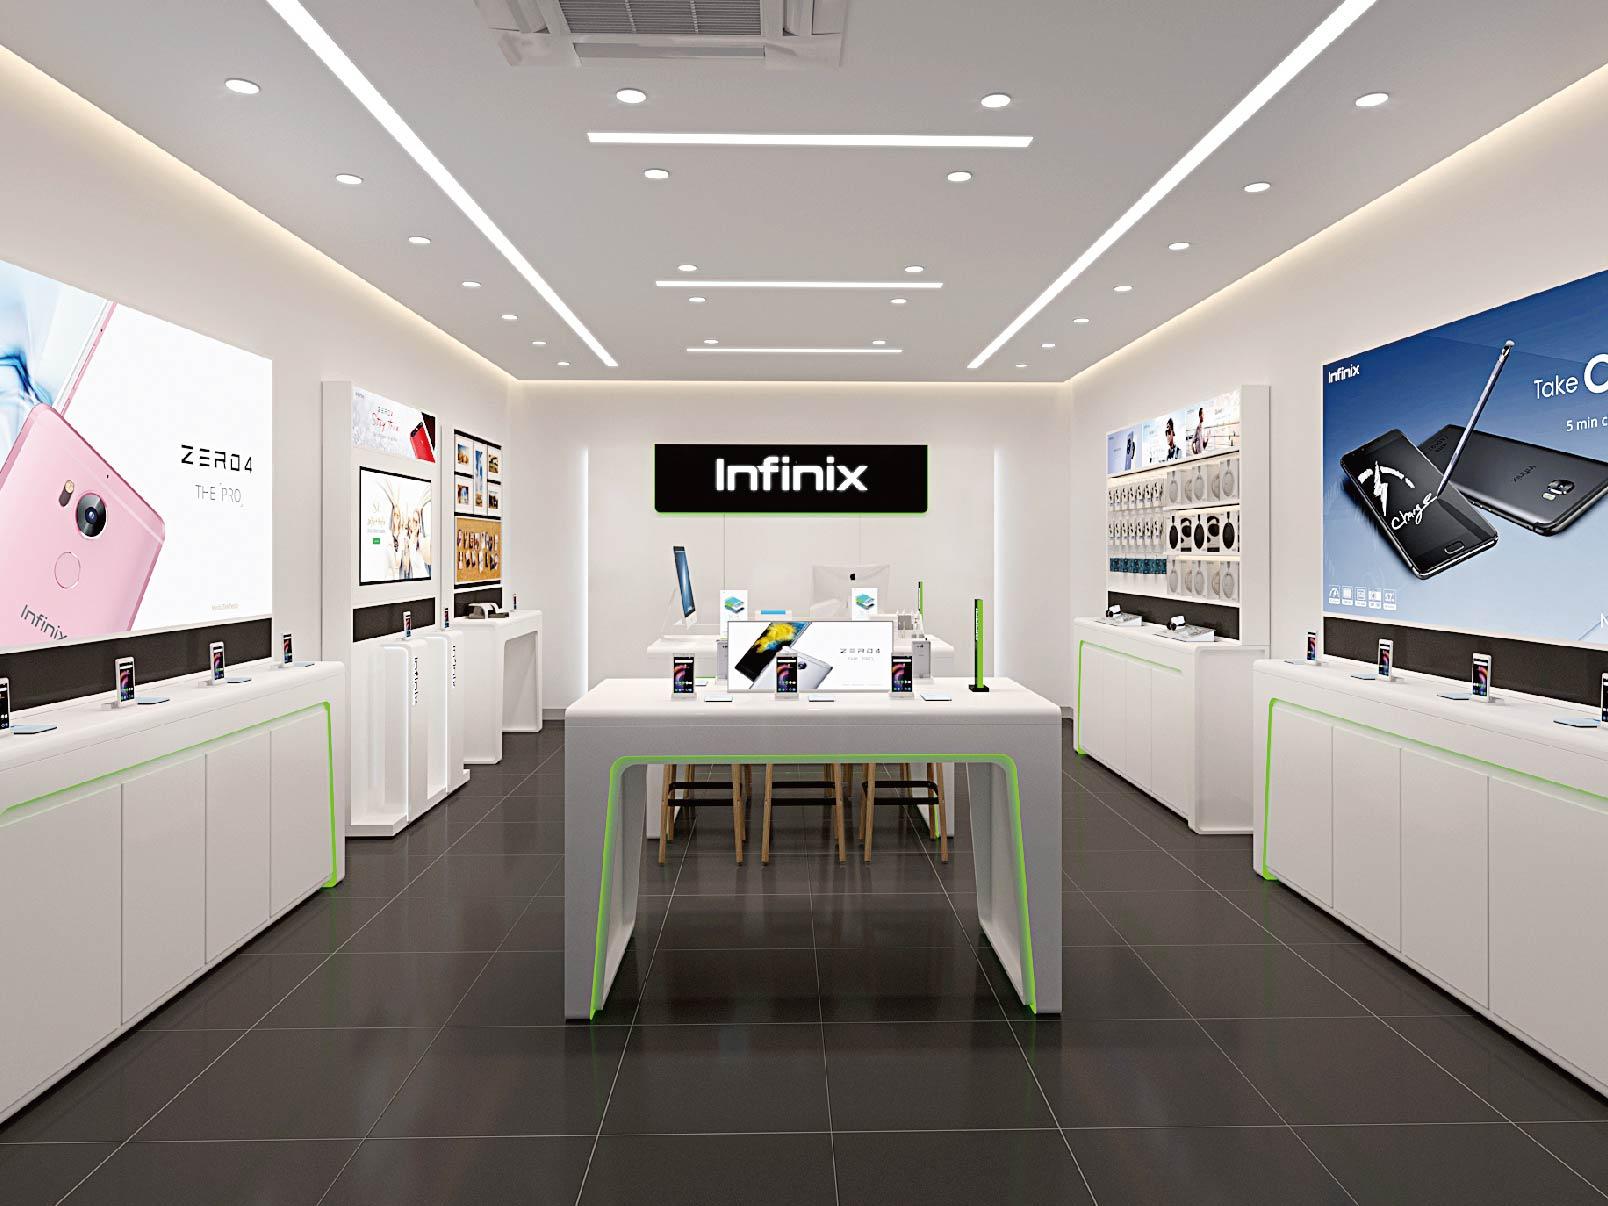 Shop Design for Infinix Flagship Store | Retail Design